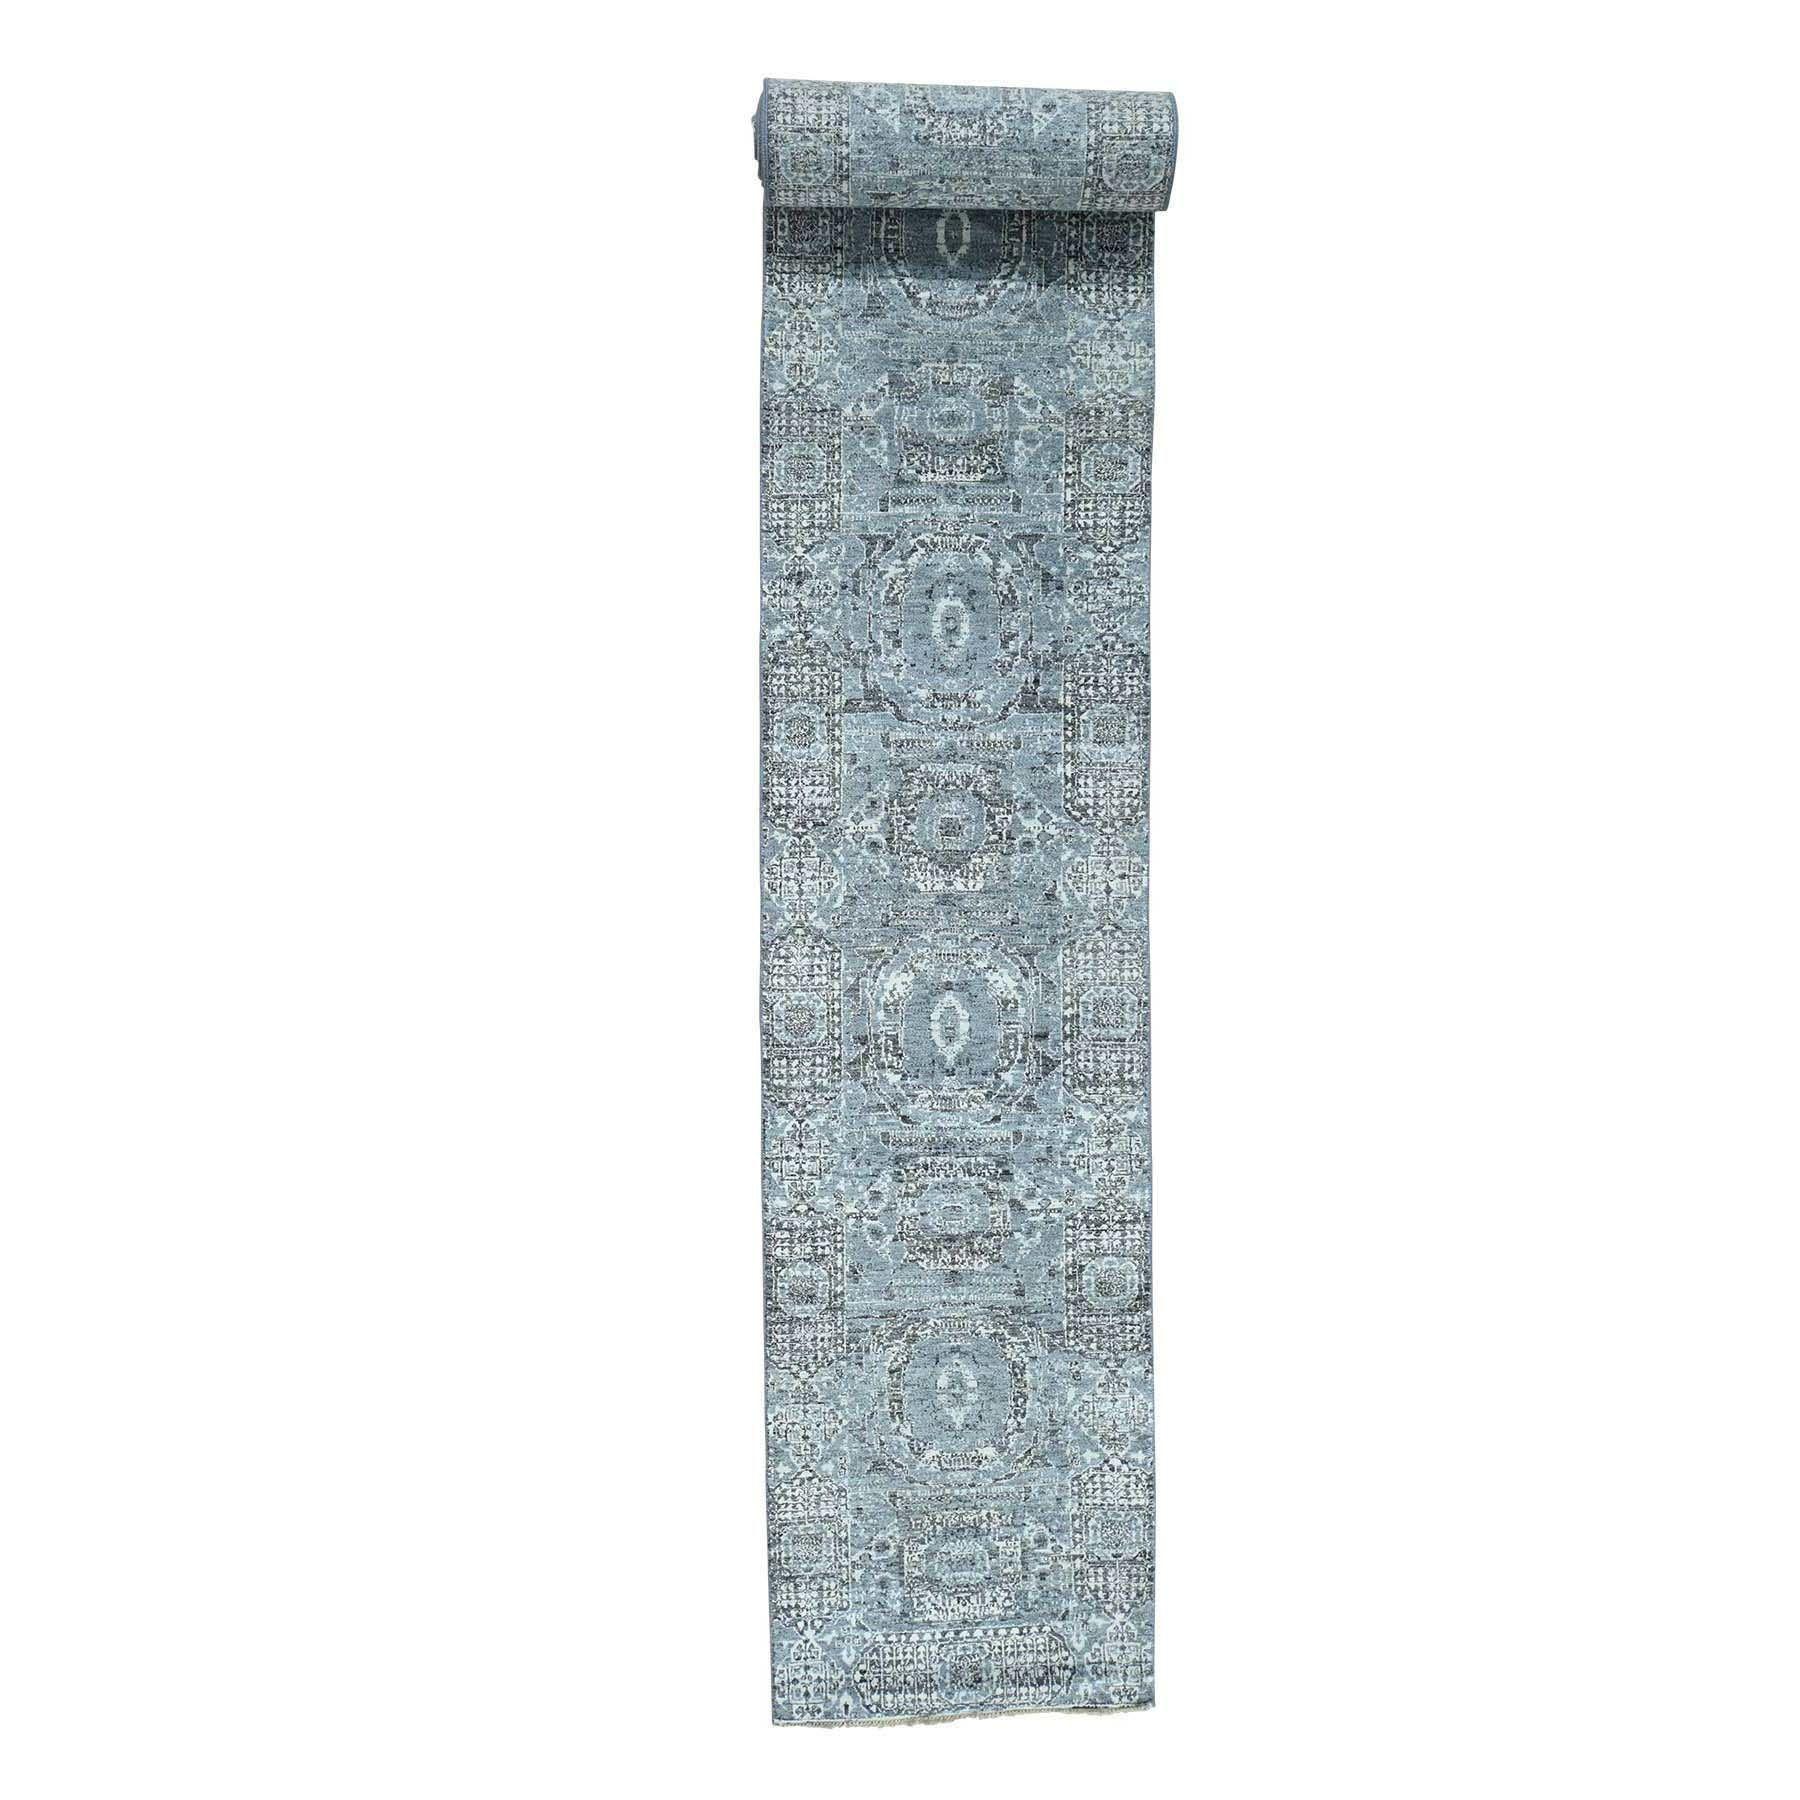 "1800getarug XL Runner Mamluk Design Undyed Natural Wool Hand-Knotted Rug (2'7x20'0) (Exact Size: 2'7"" x 20'0""), Blue"